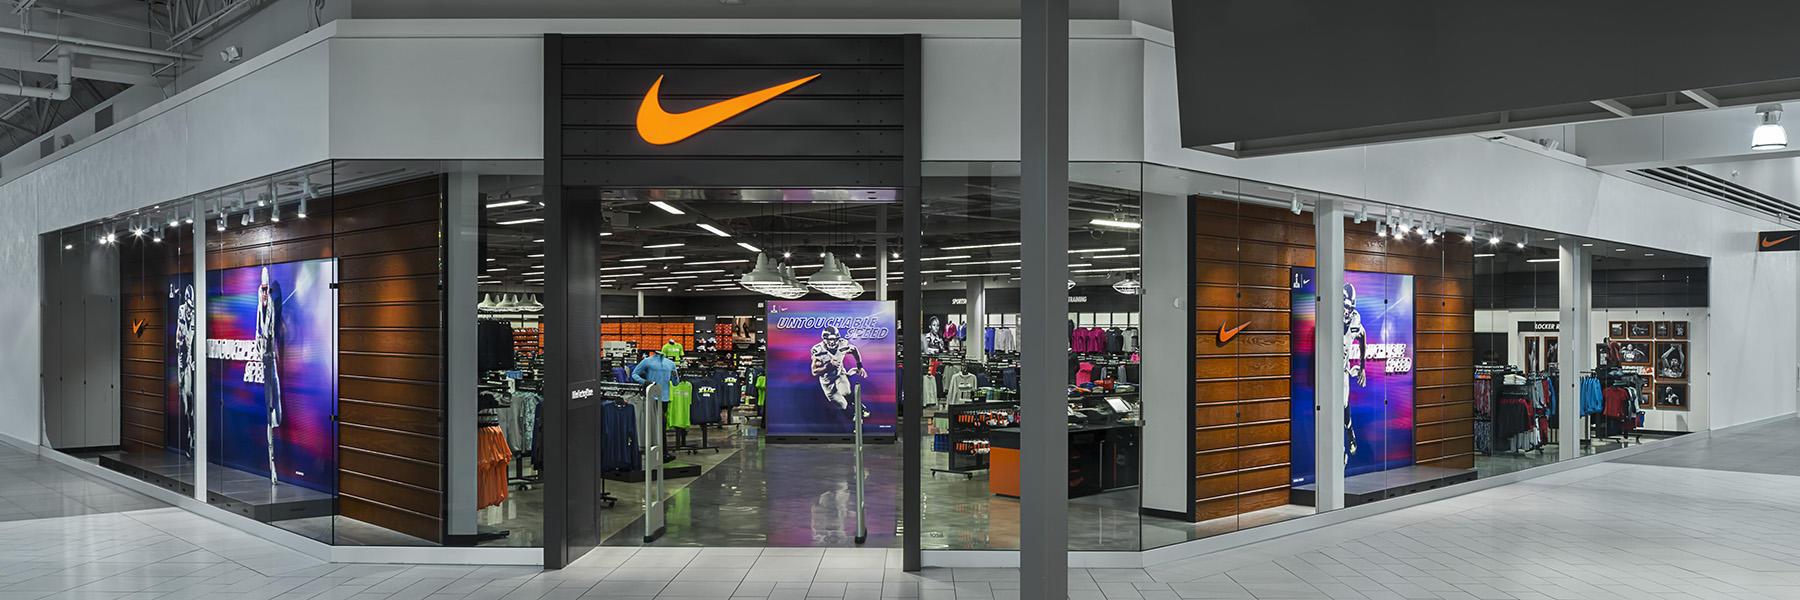 074b6fe6f94 Nike Factory Store - Auburn. Auburn, WA. Nike.com